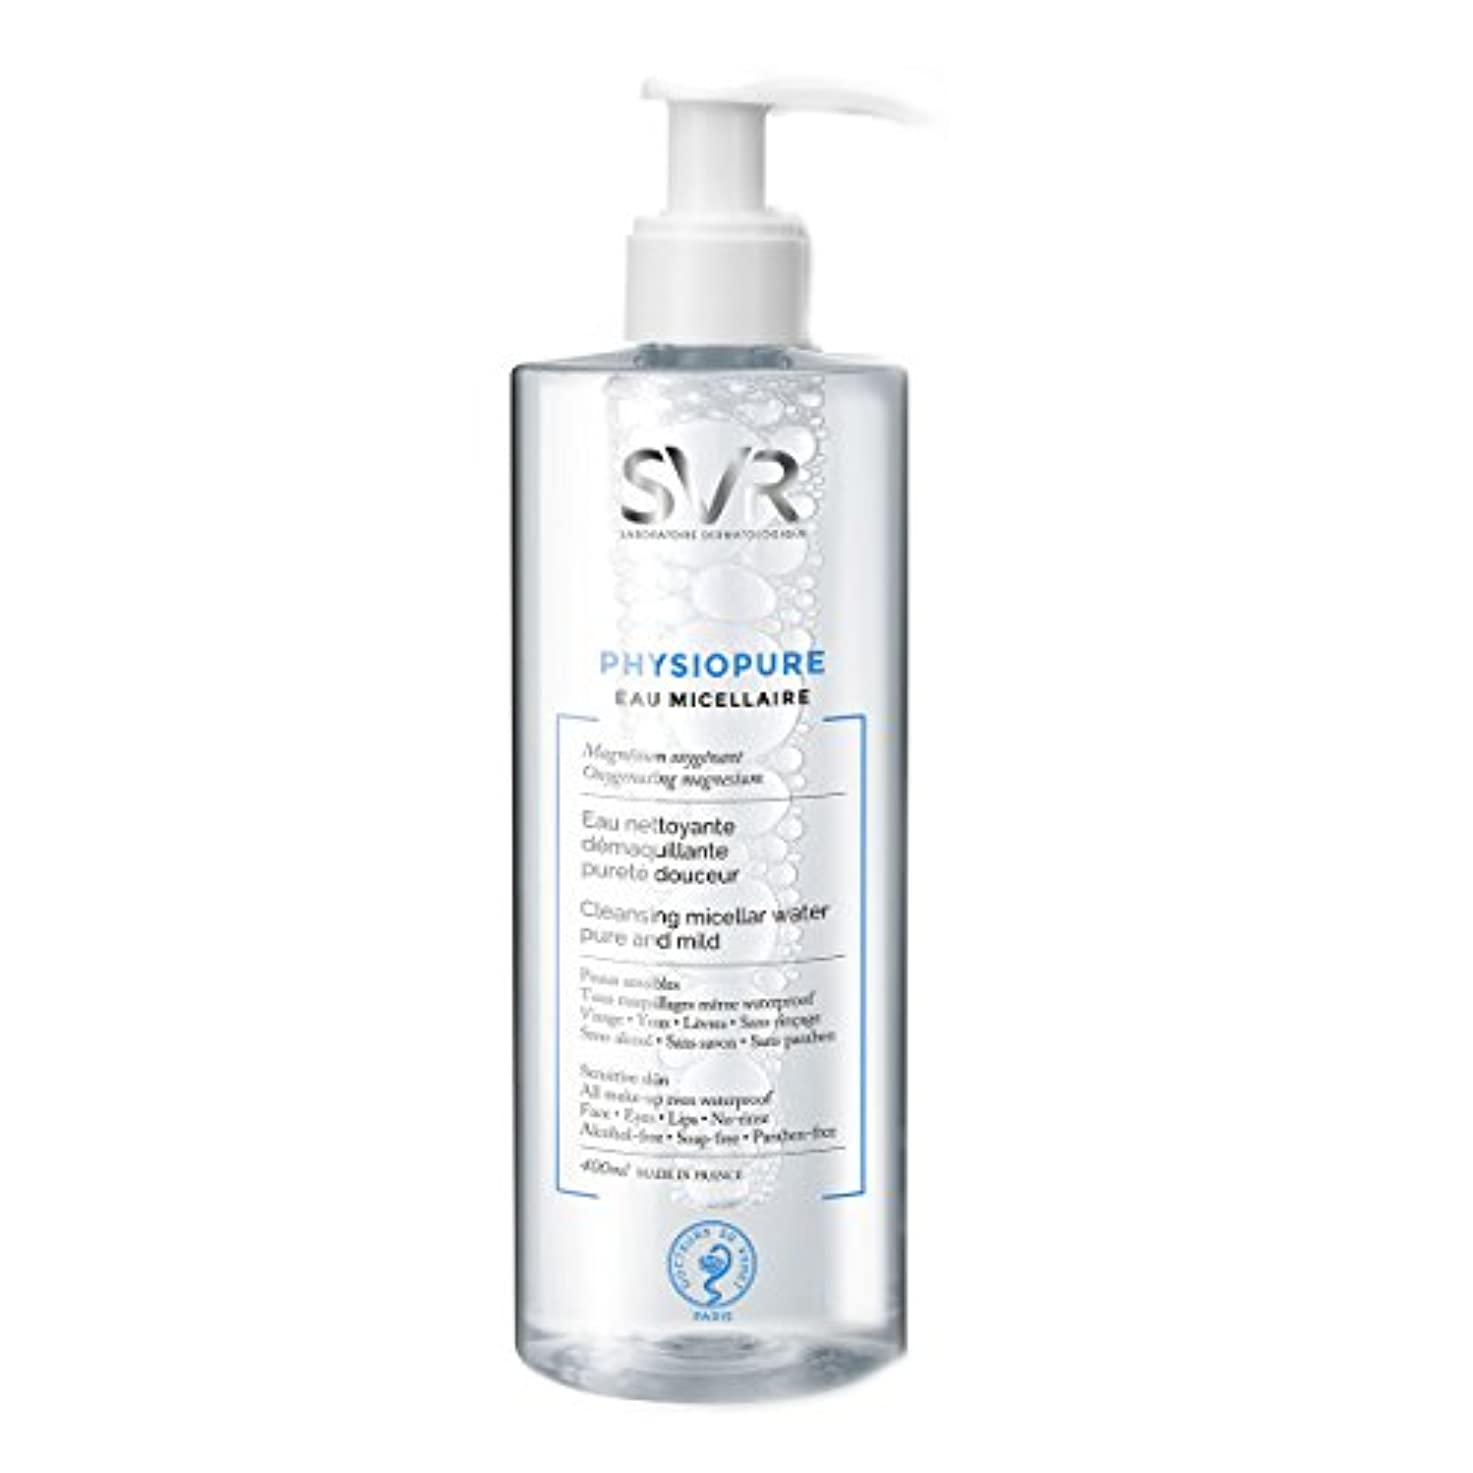 Svr Physiopure Cleansing Micellar Water 400ml [並行輸入品]